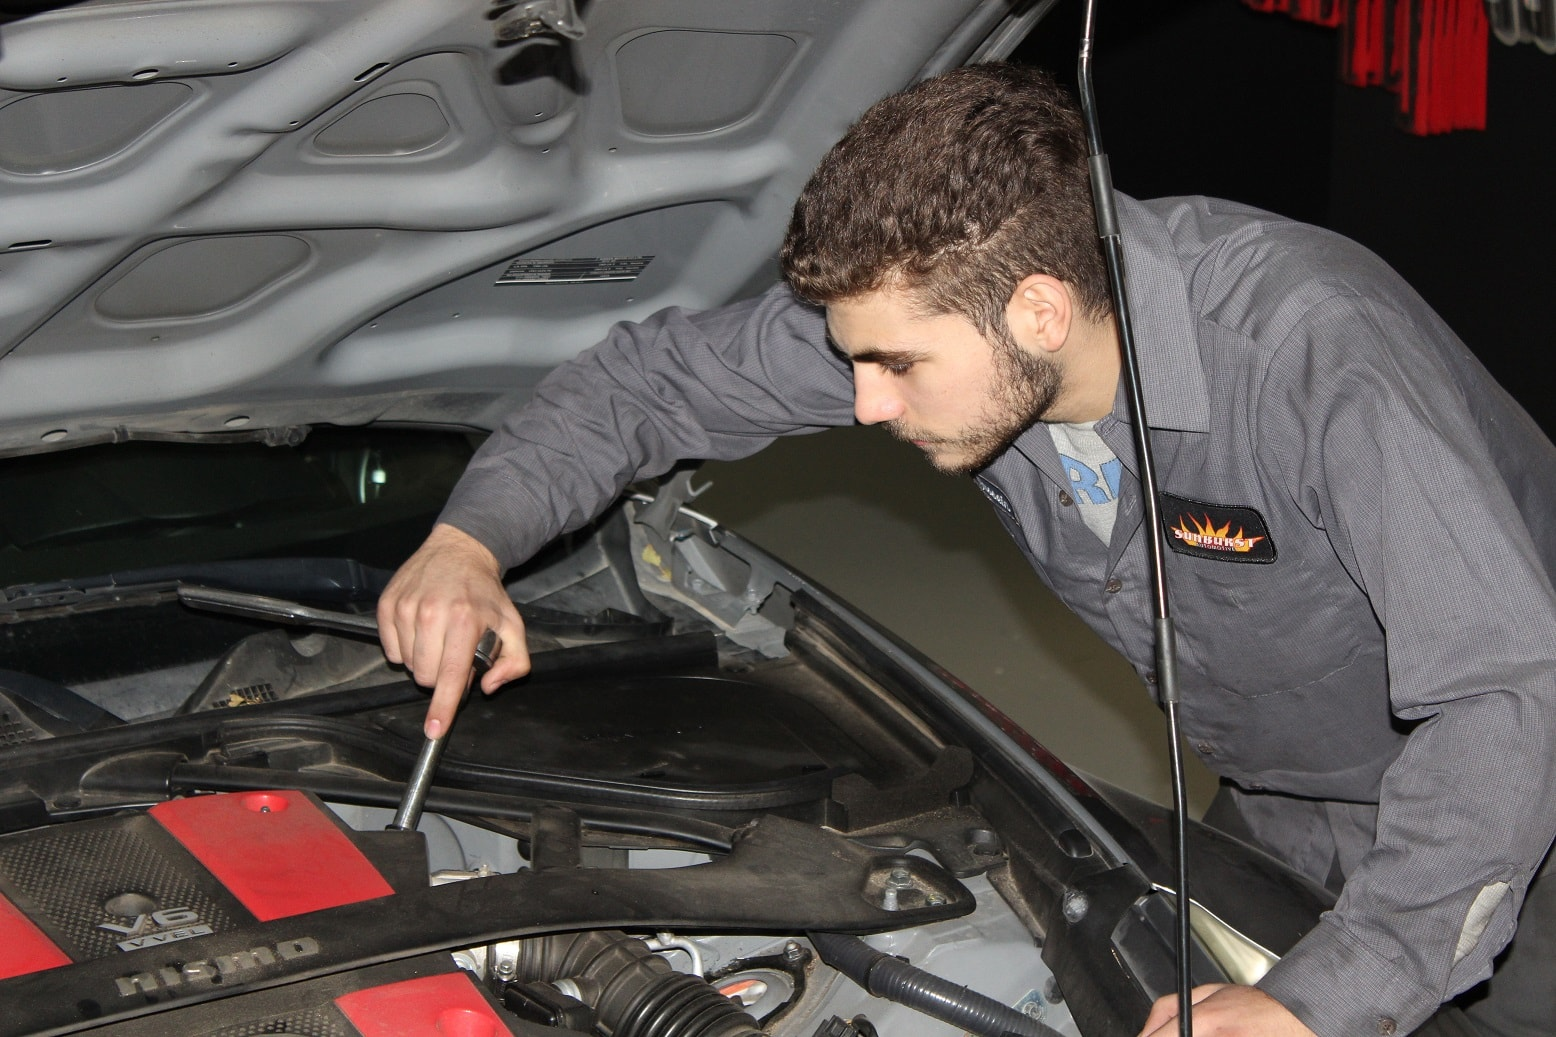 AUTO SERVICE - Preventative Maintenance